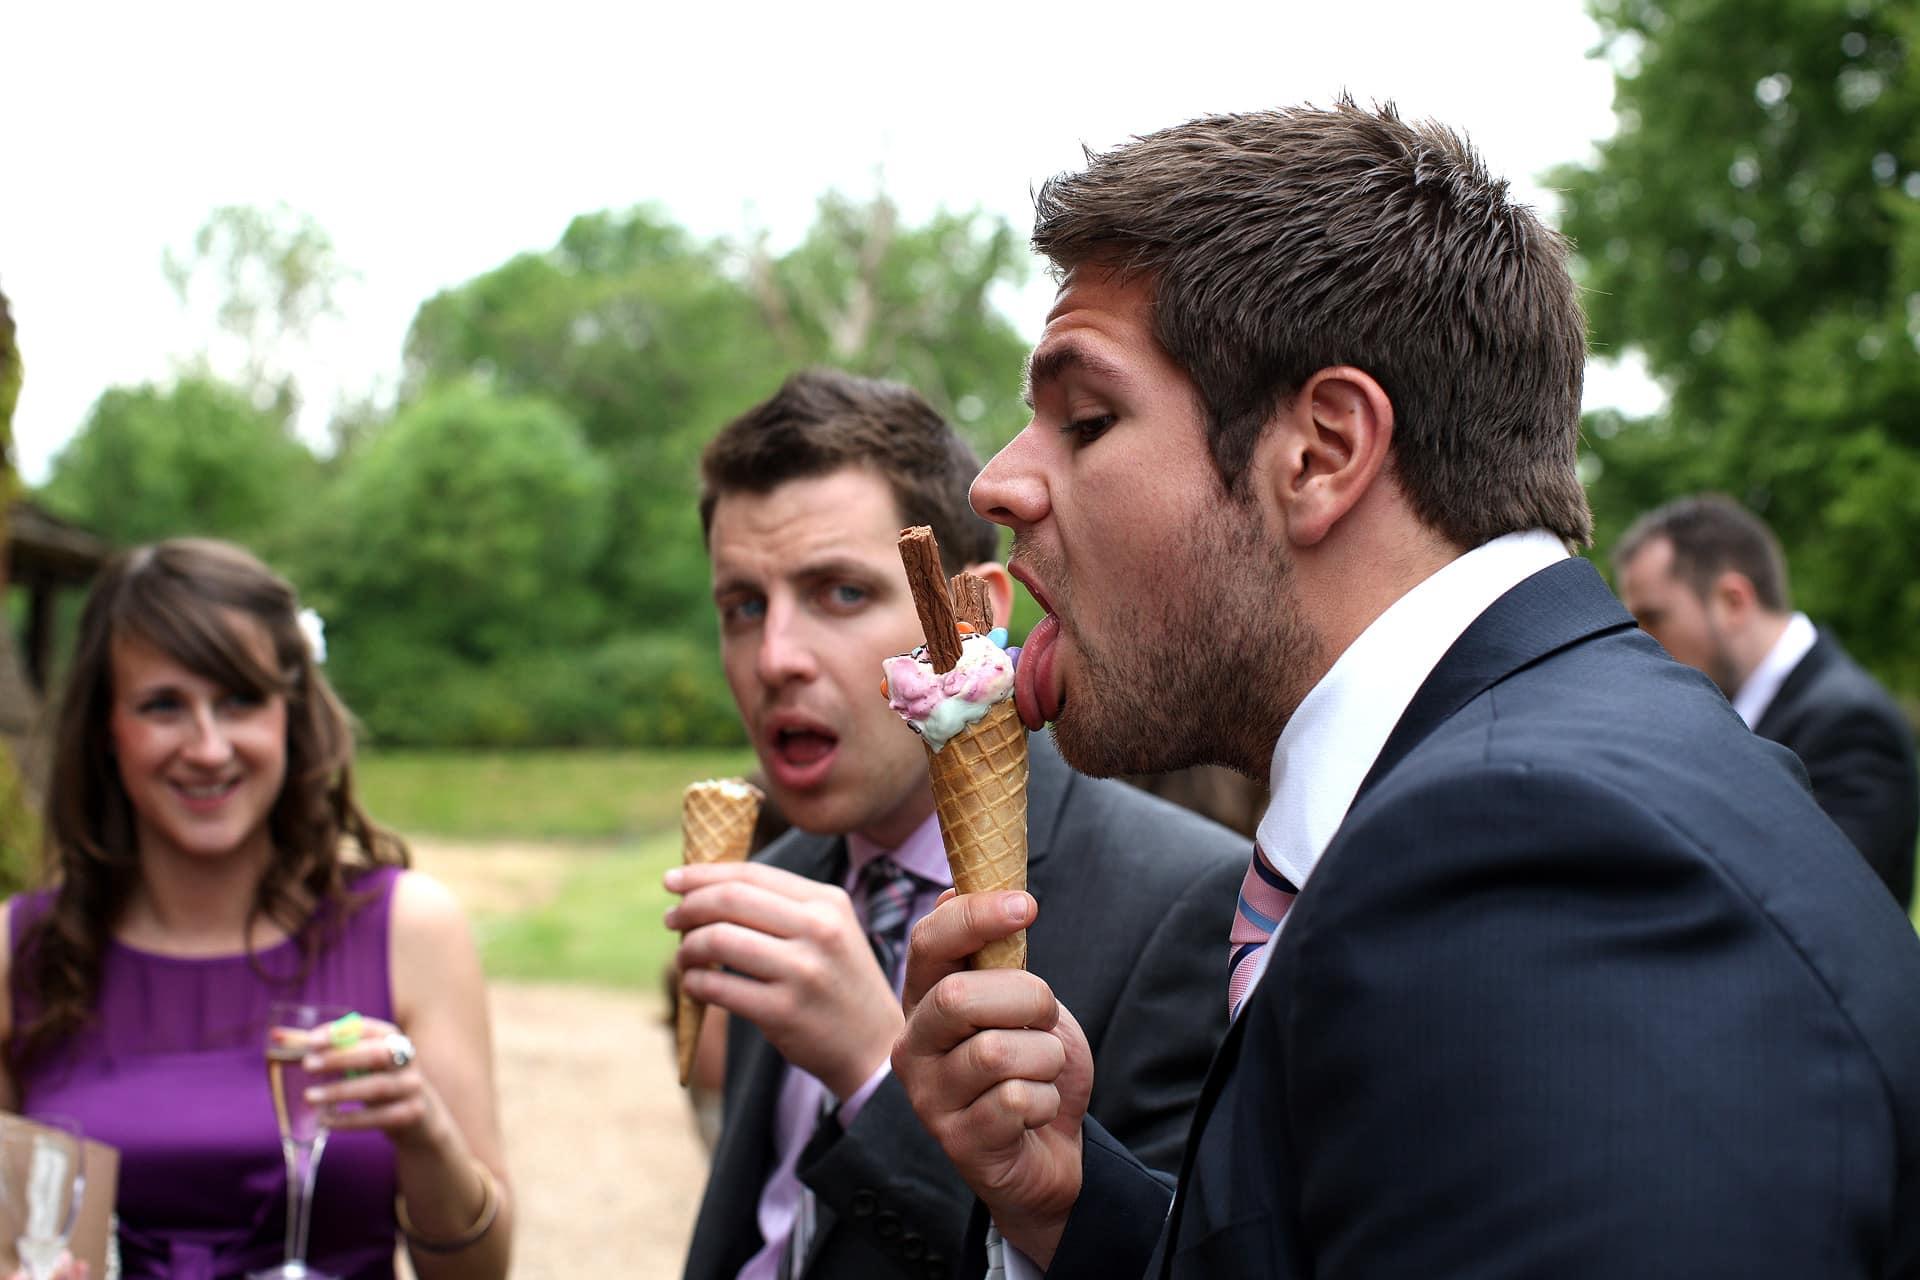 wedding-ice-cream-fun-silly-funny